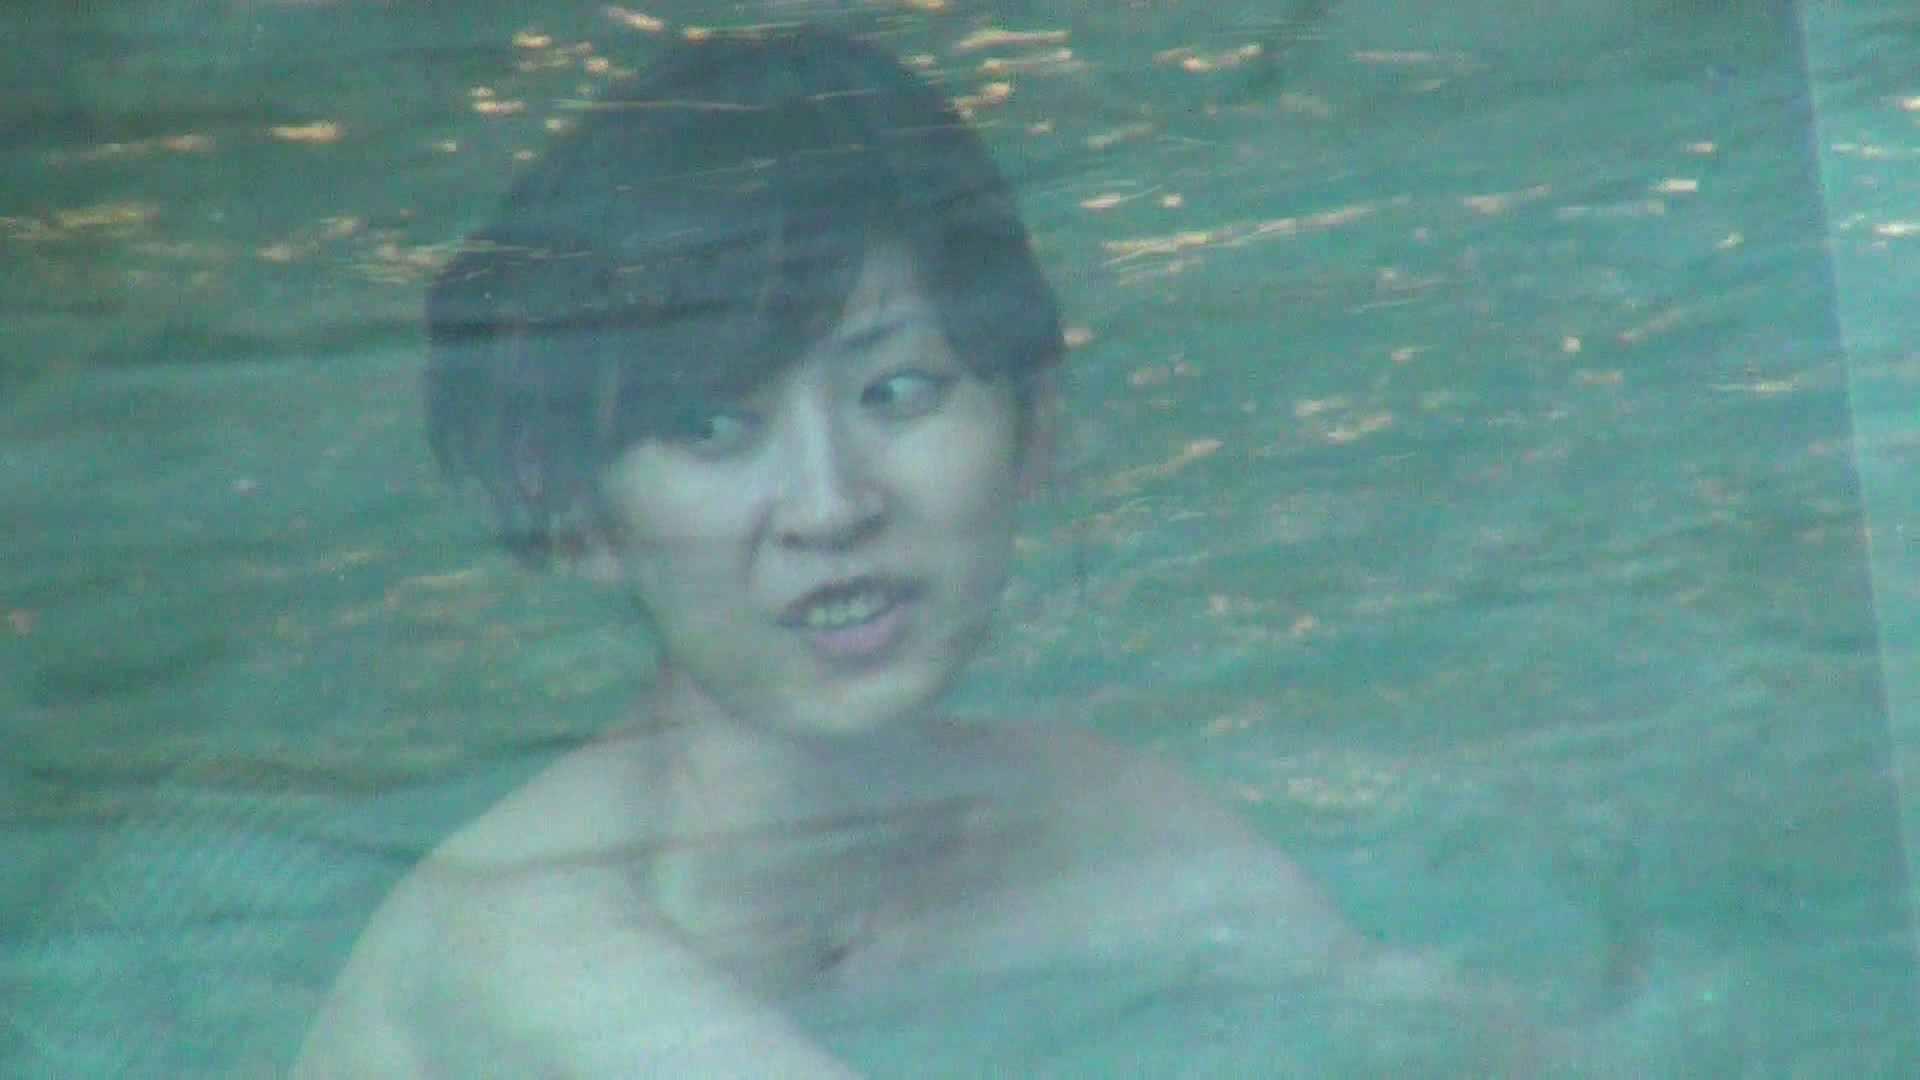 Aquaな露天風呂Vol.294 綺麗なOLたち  84枚 60